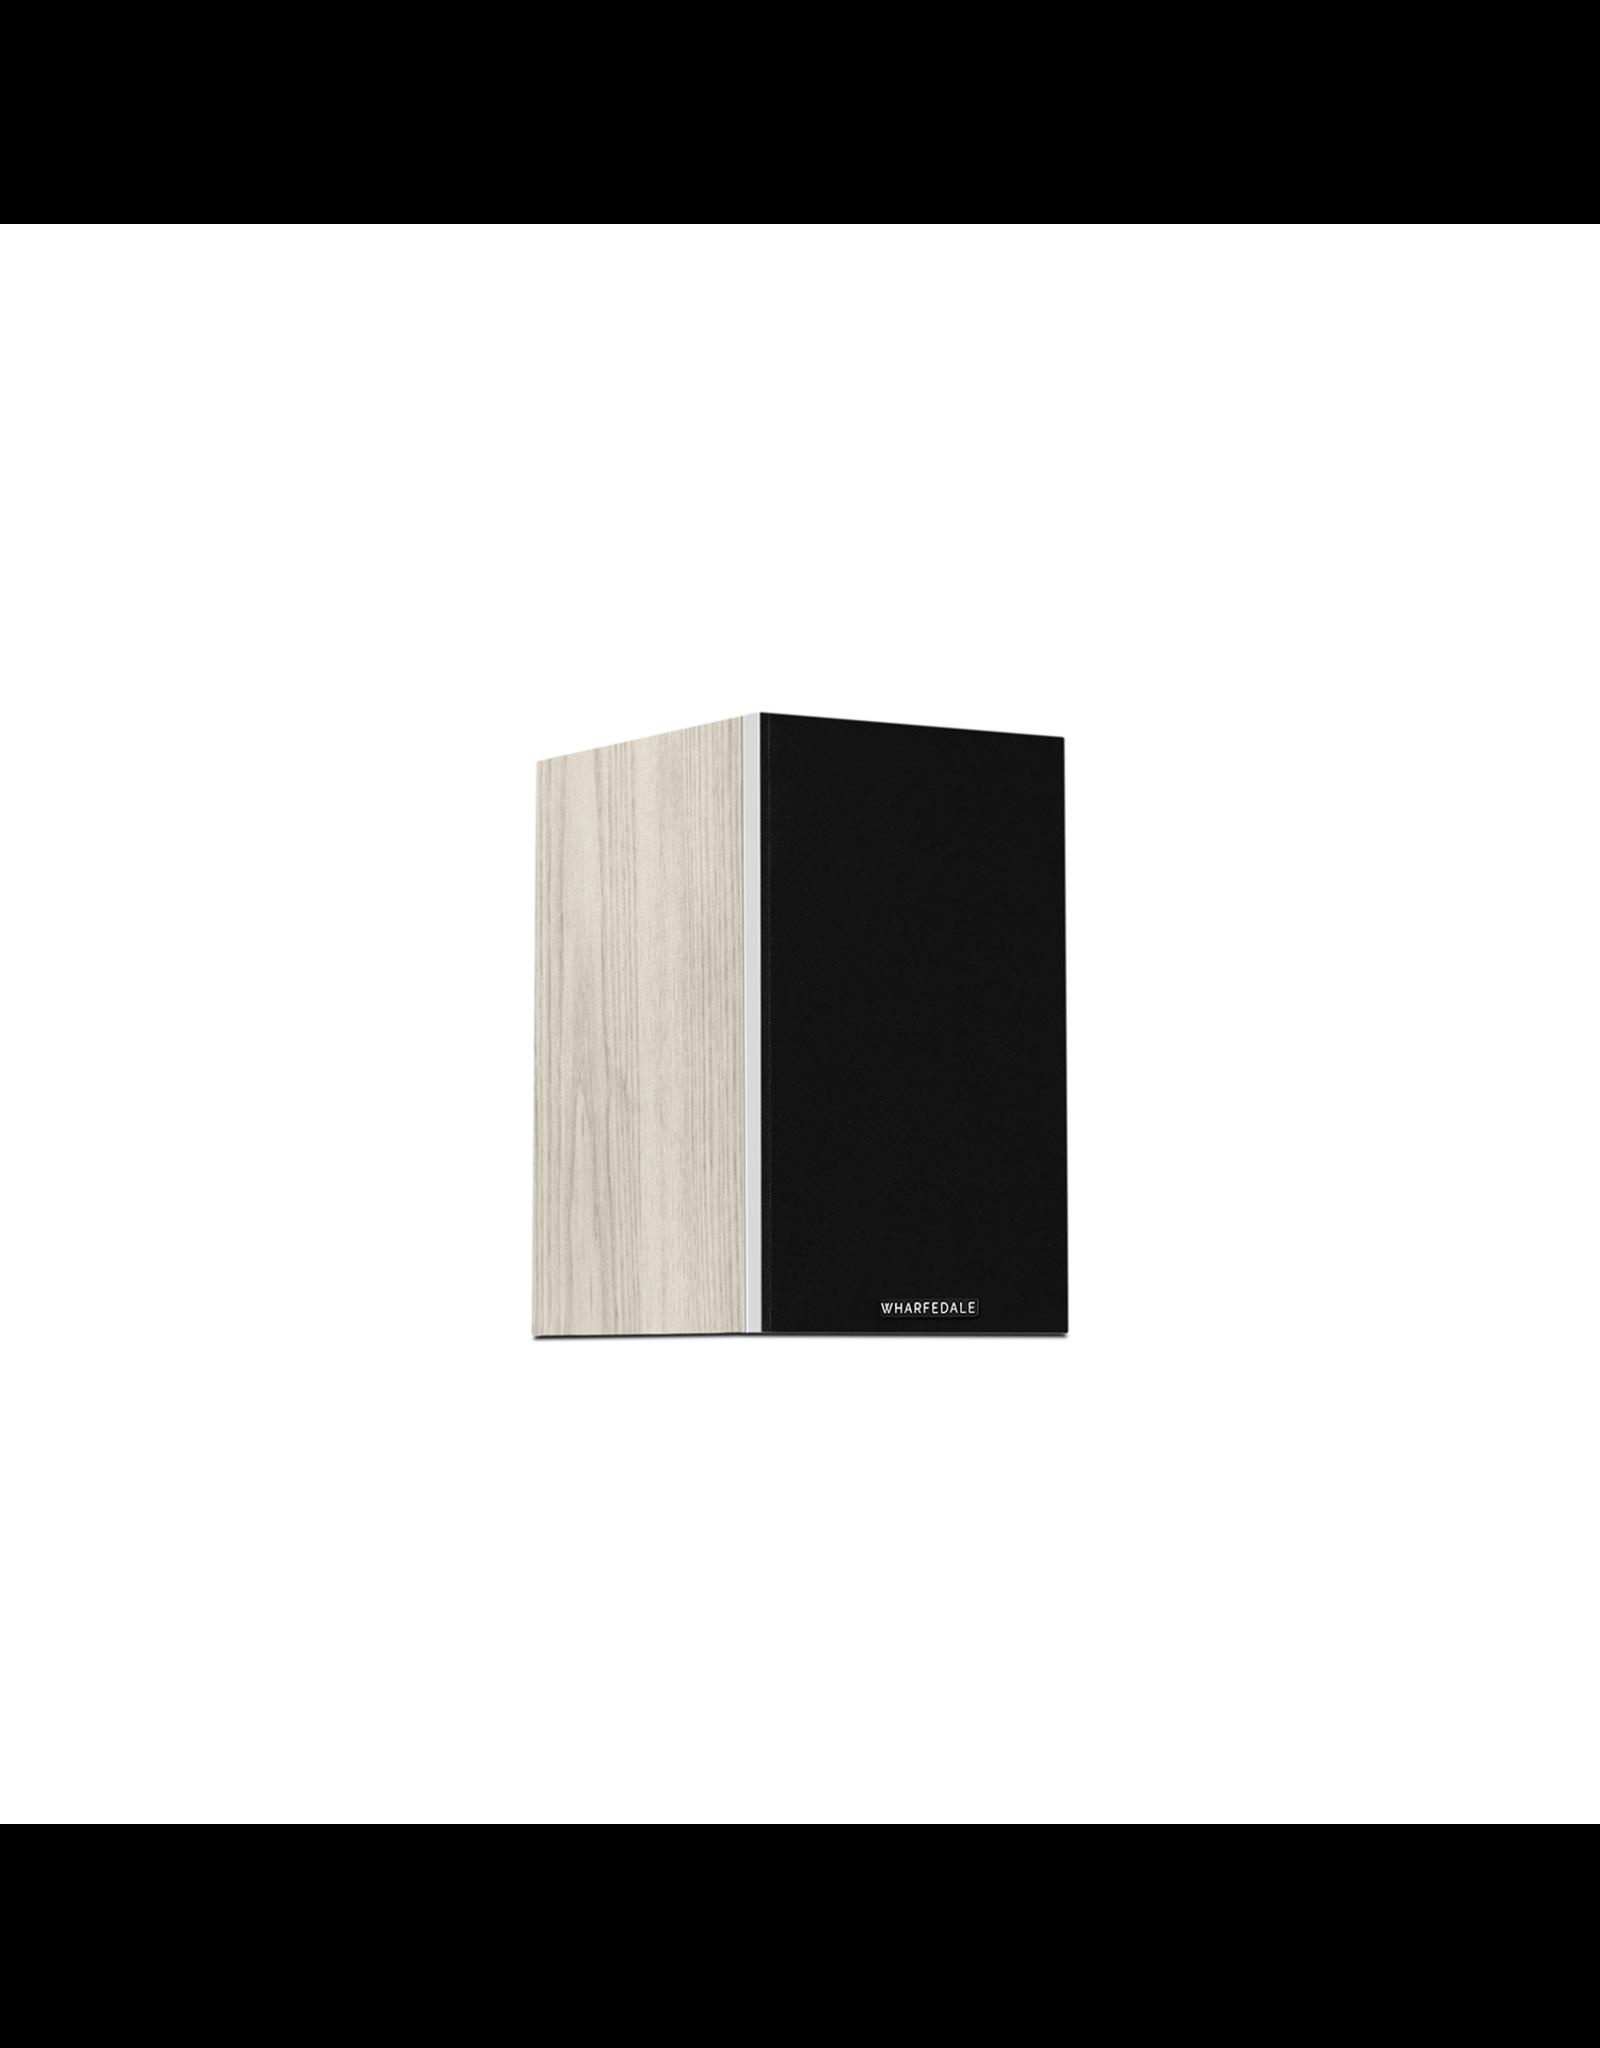 Wharfedale Wharfedale Diamond 12.0 Bookshelf Speakers